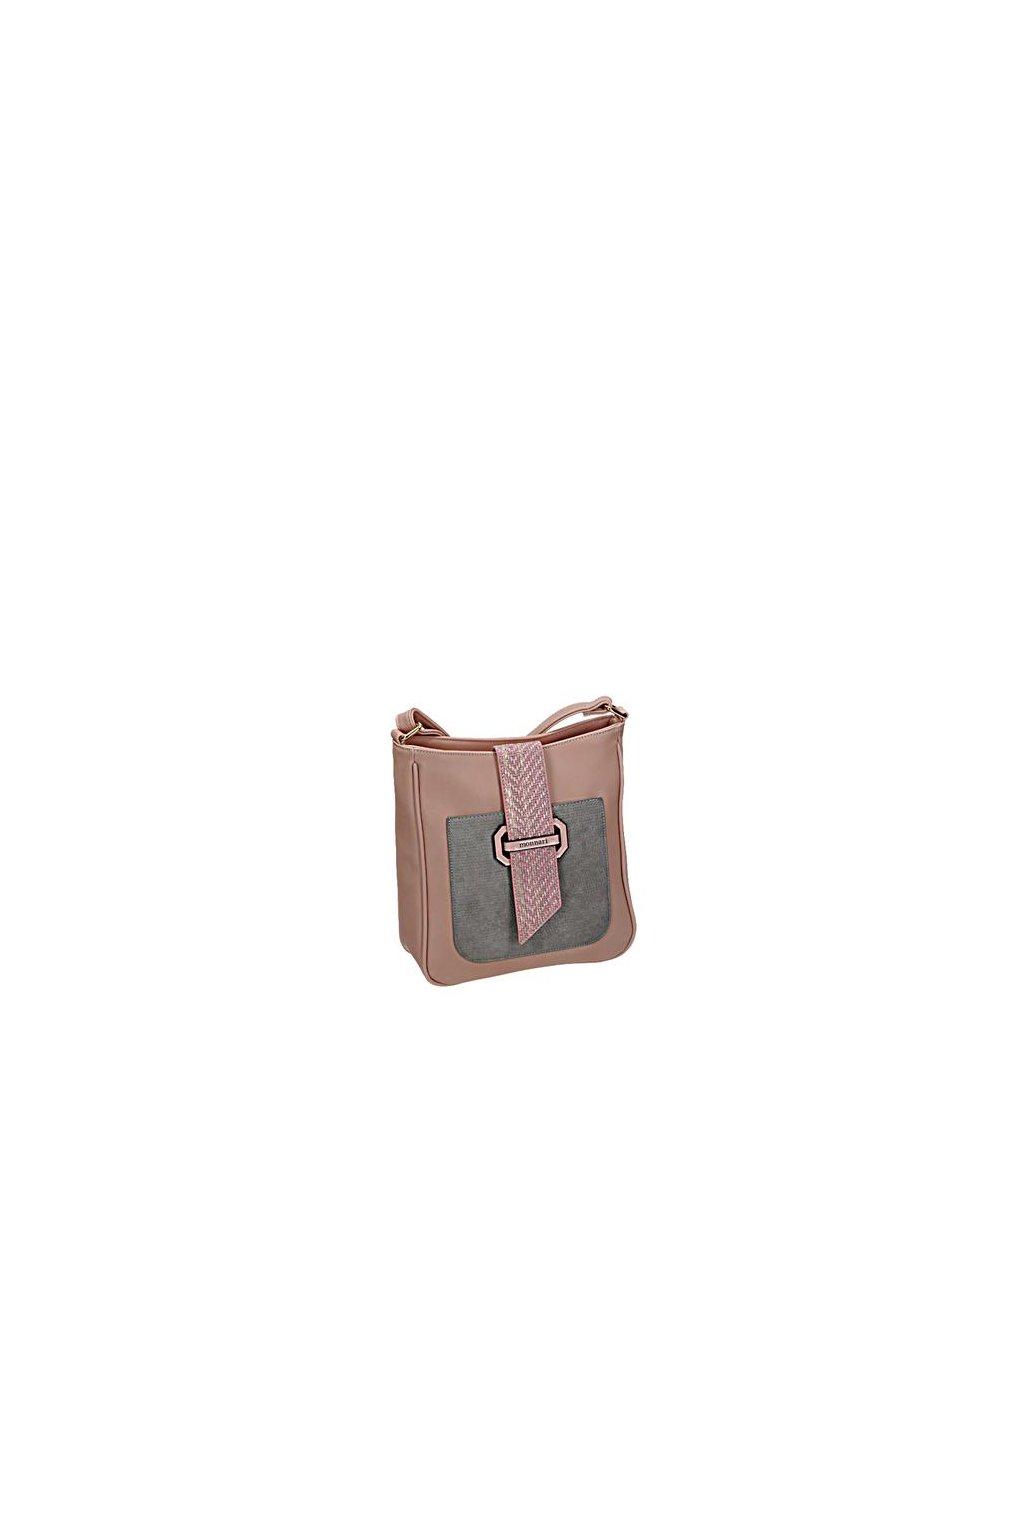 Ružová crossbody kabelka MONNARI BAG 0170-004 W18  cd19ae84a43